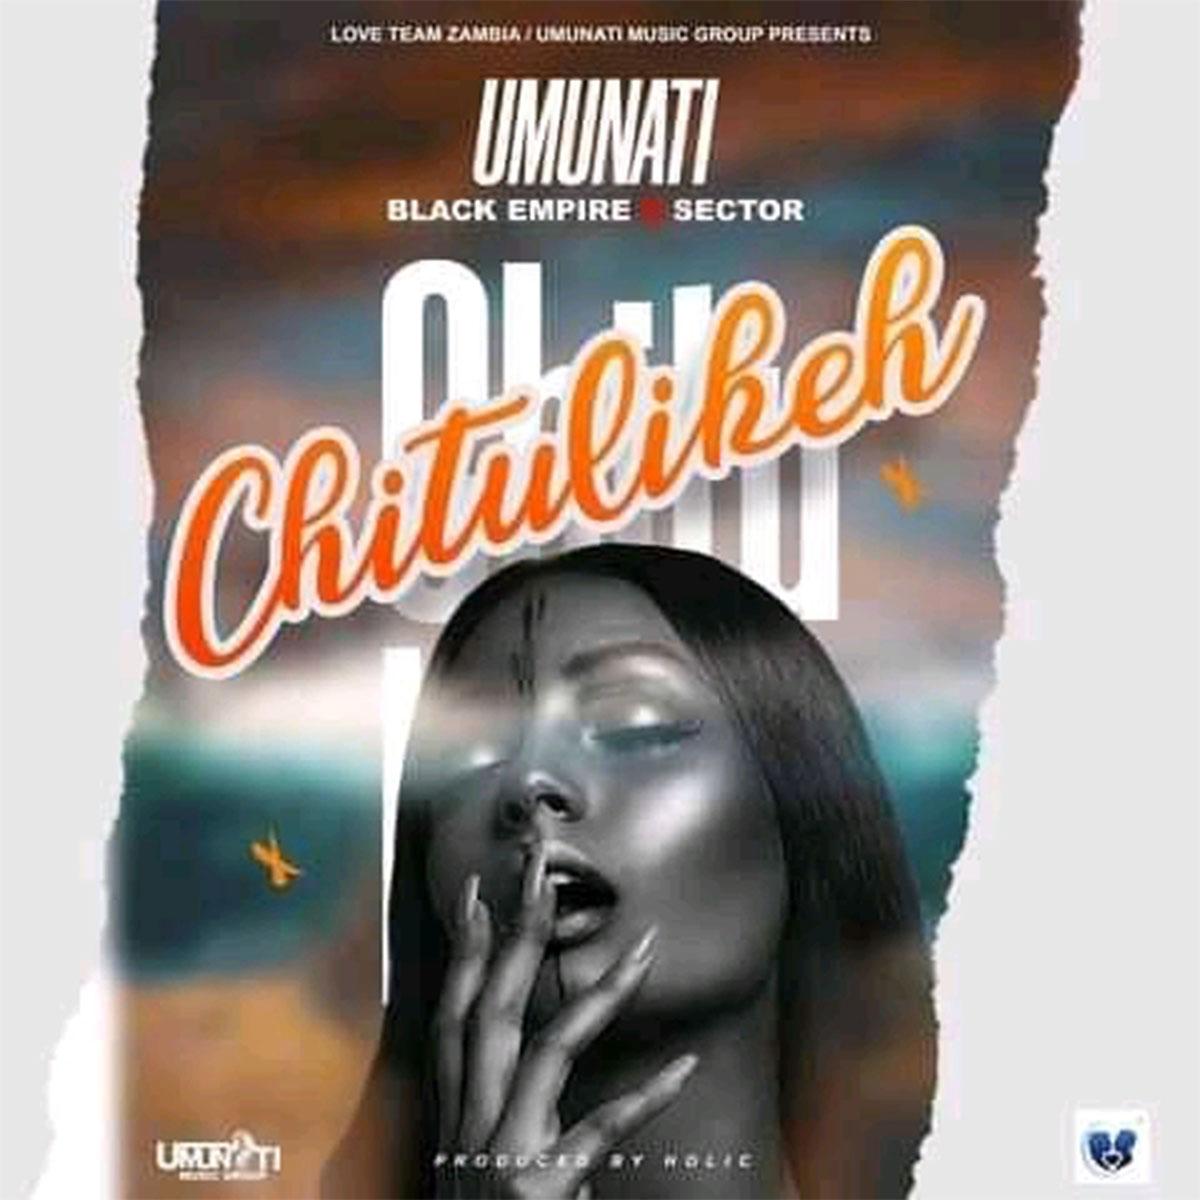 Vizzy Umunati X Black Empire X Sector - Chitulikeh (Prod. Holic)